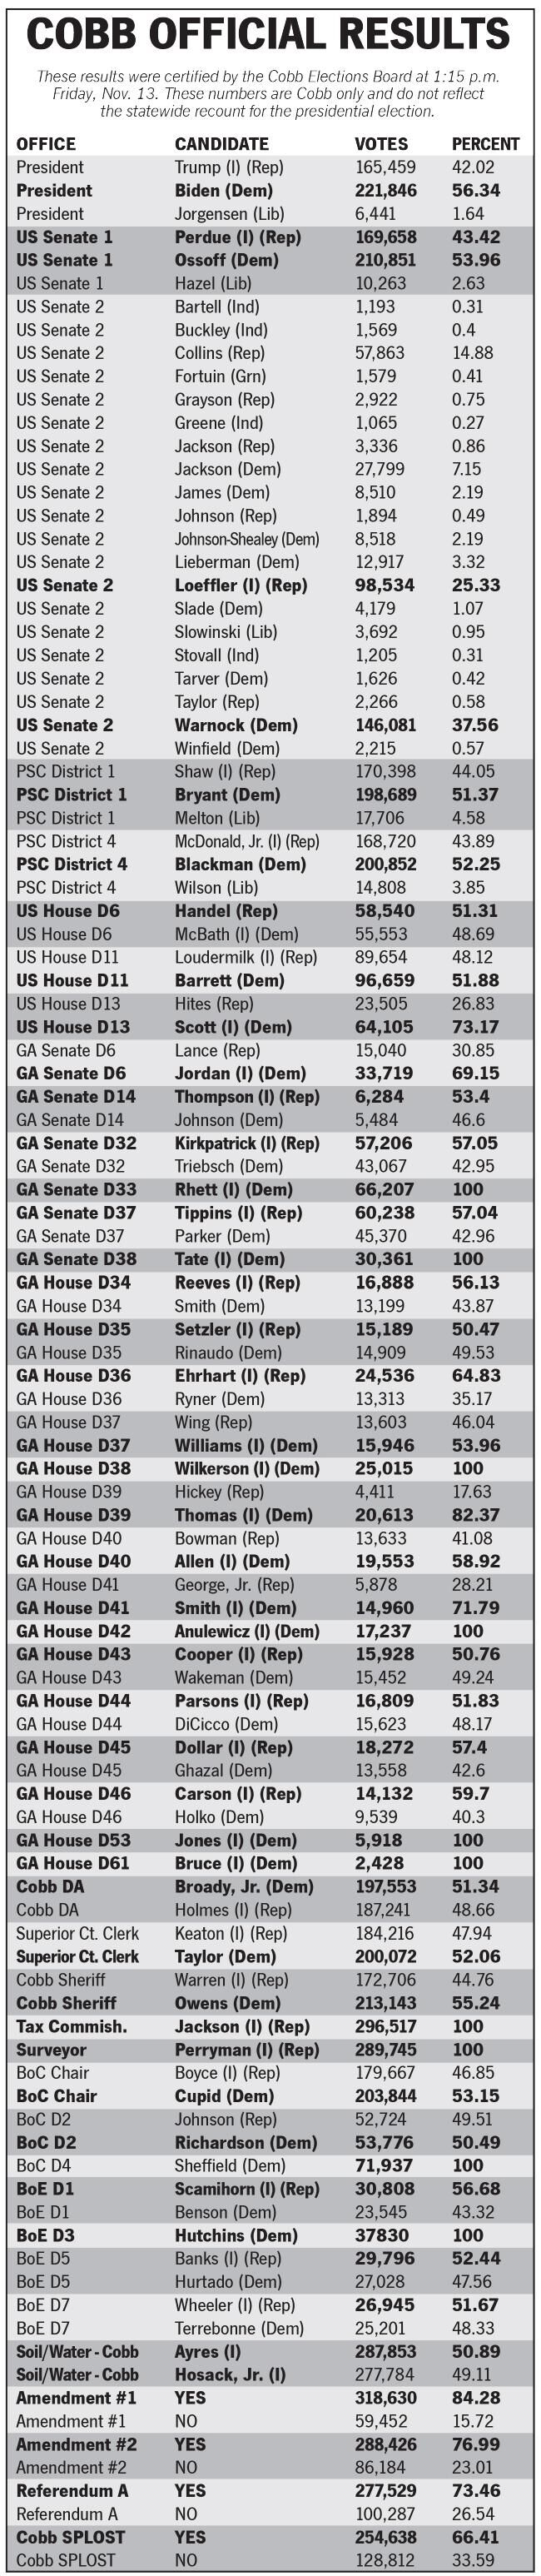 Cobb Certified Results - Nov. 13, 2020.pdf